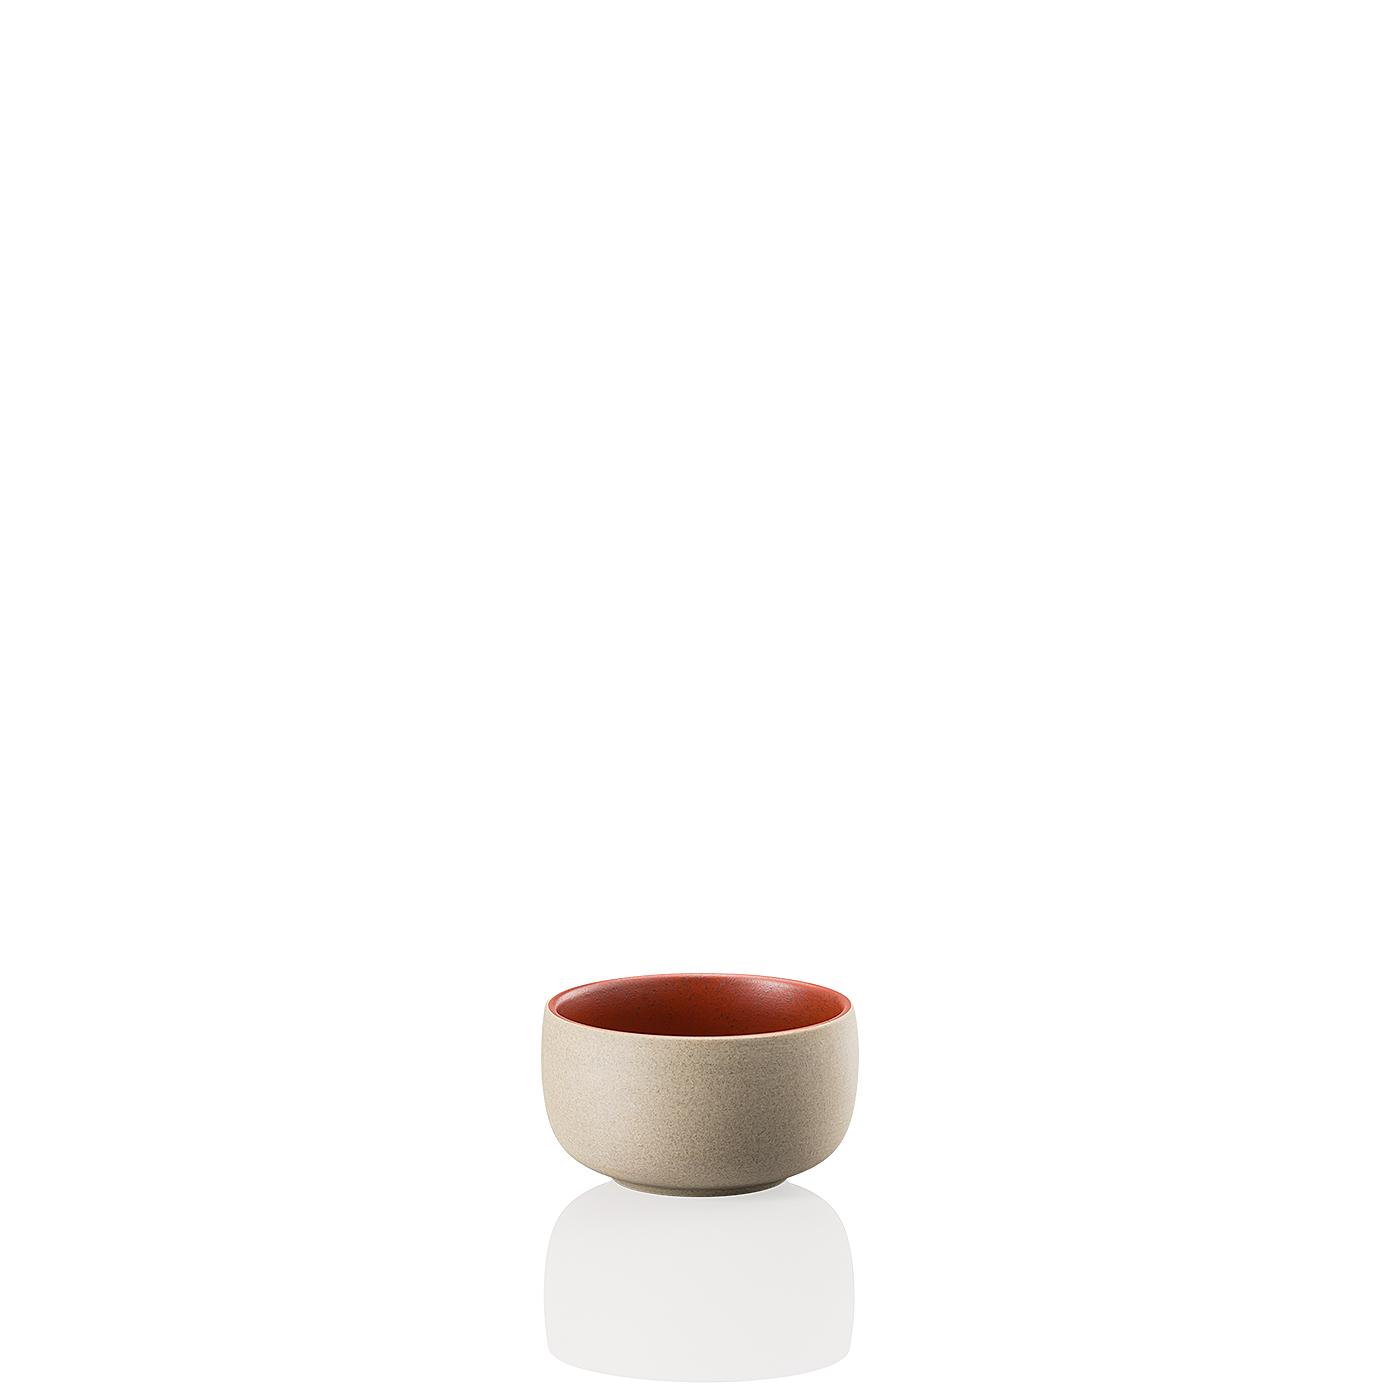 Dipschale Joyn Stoneware Spark Arzberg